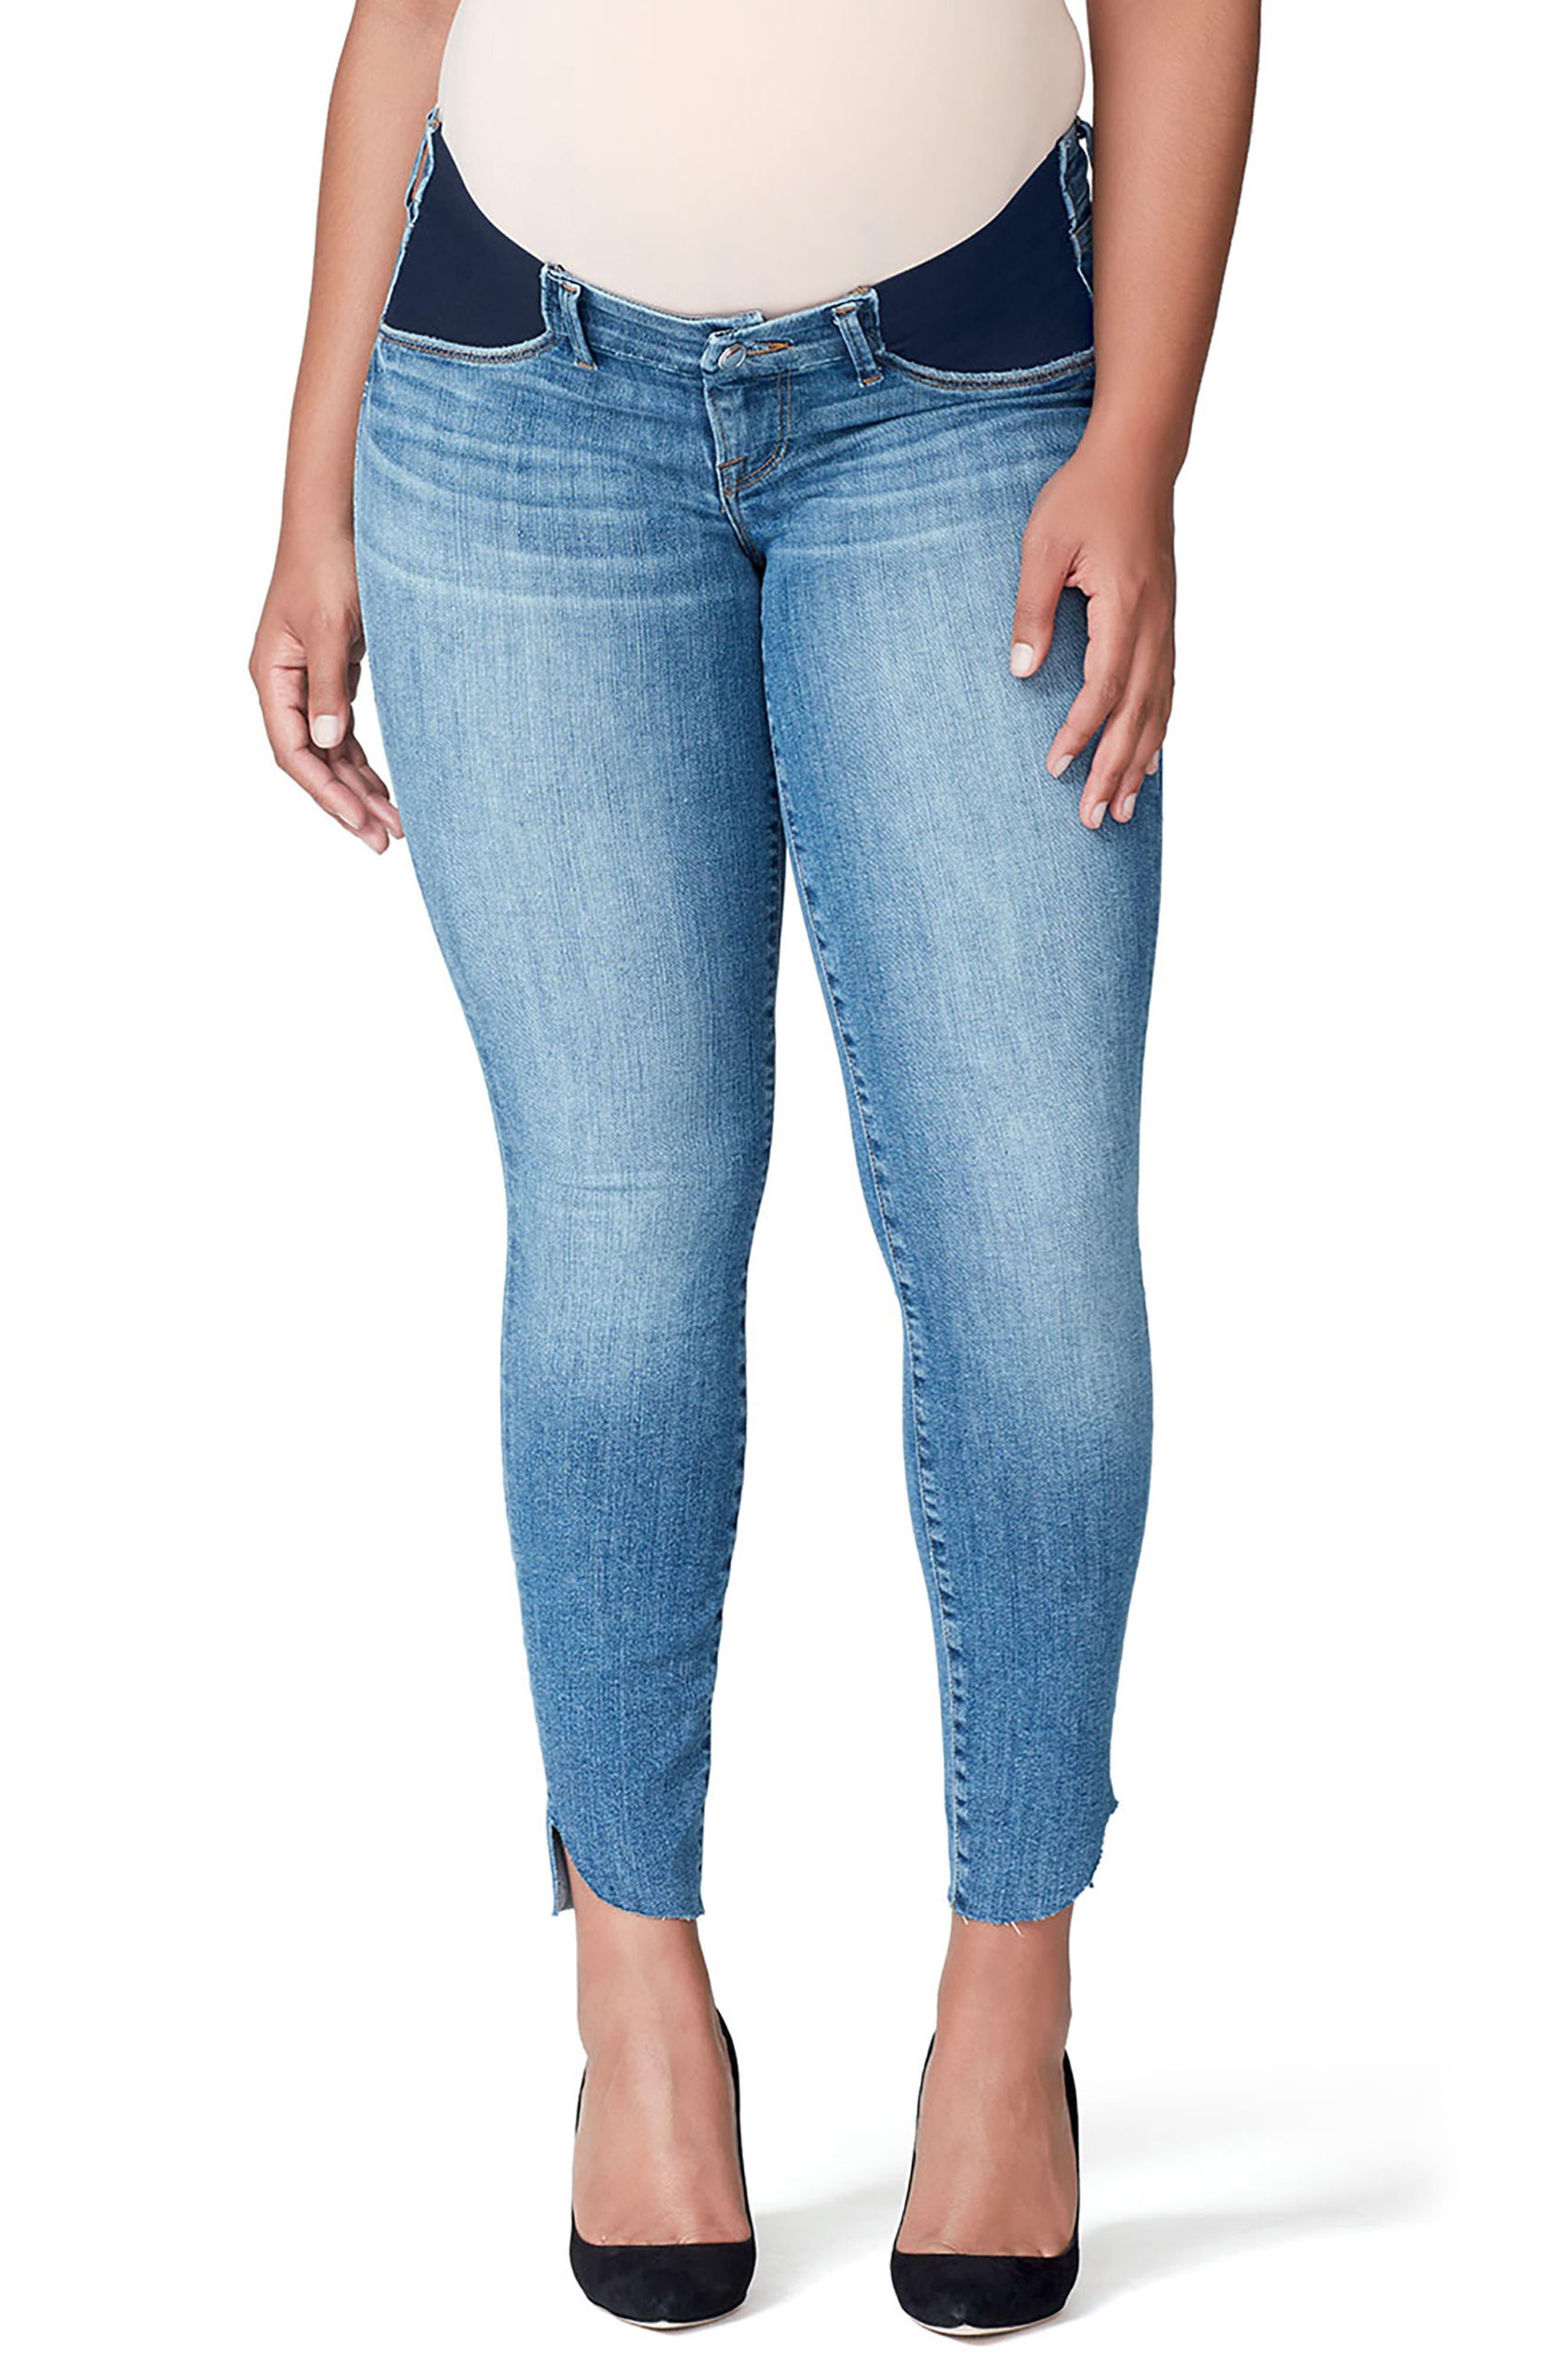 Main Image - Good American Good Mama The Honeymoon Low Rise Cascade Hem Maternity Skinny Jeans